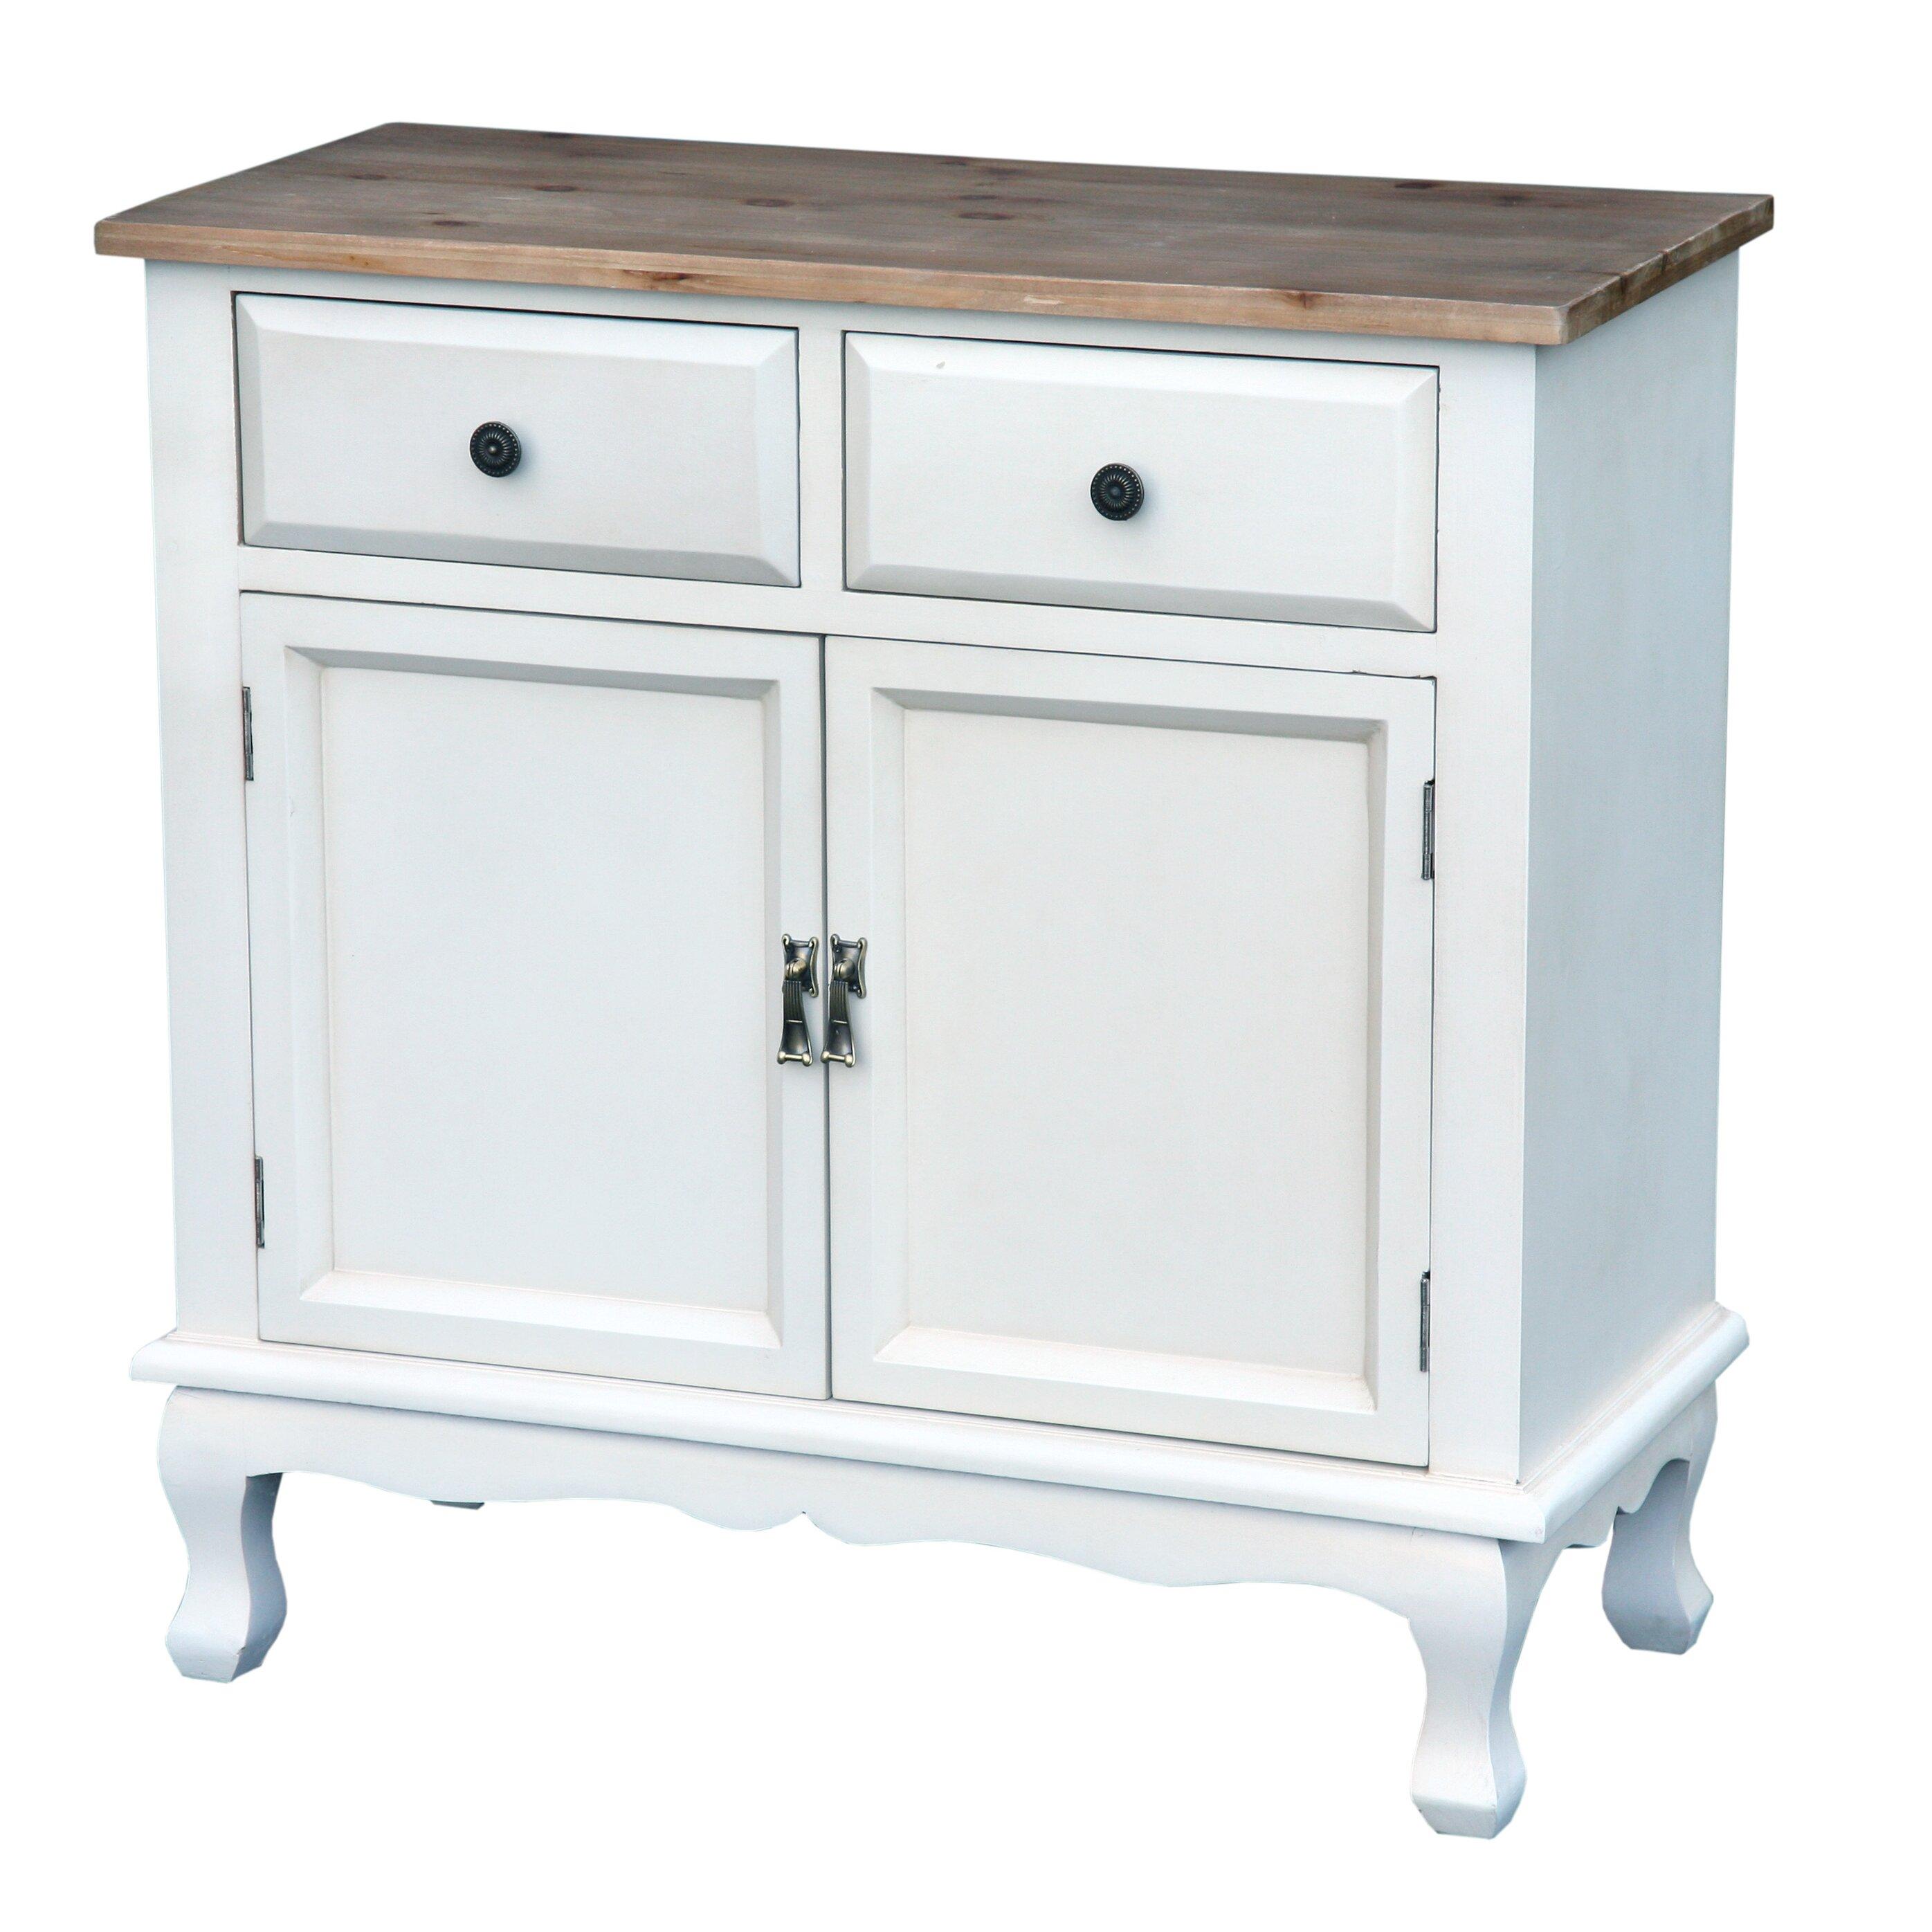 trade fair kommode caella. Black Bedroom Furniture Sets. Home Design Ideas